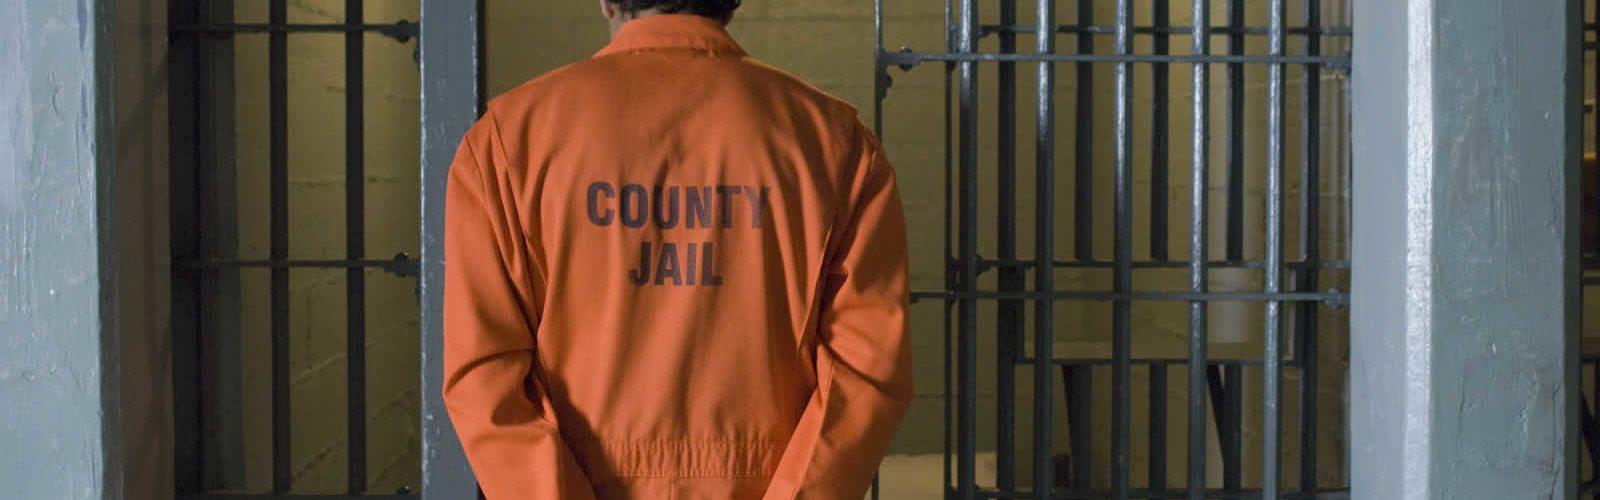 arrestation-prison-incarceration-droits-police-usa-une